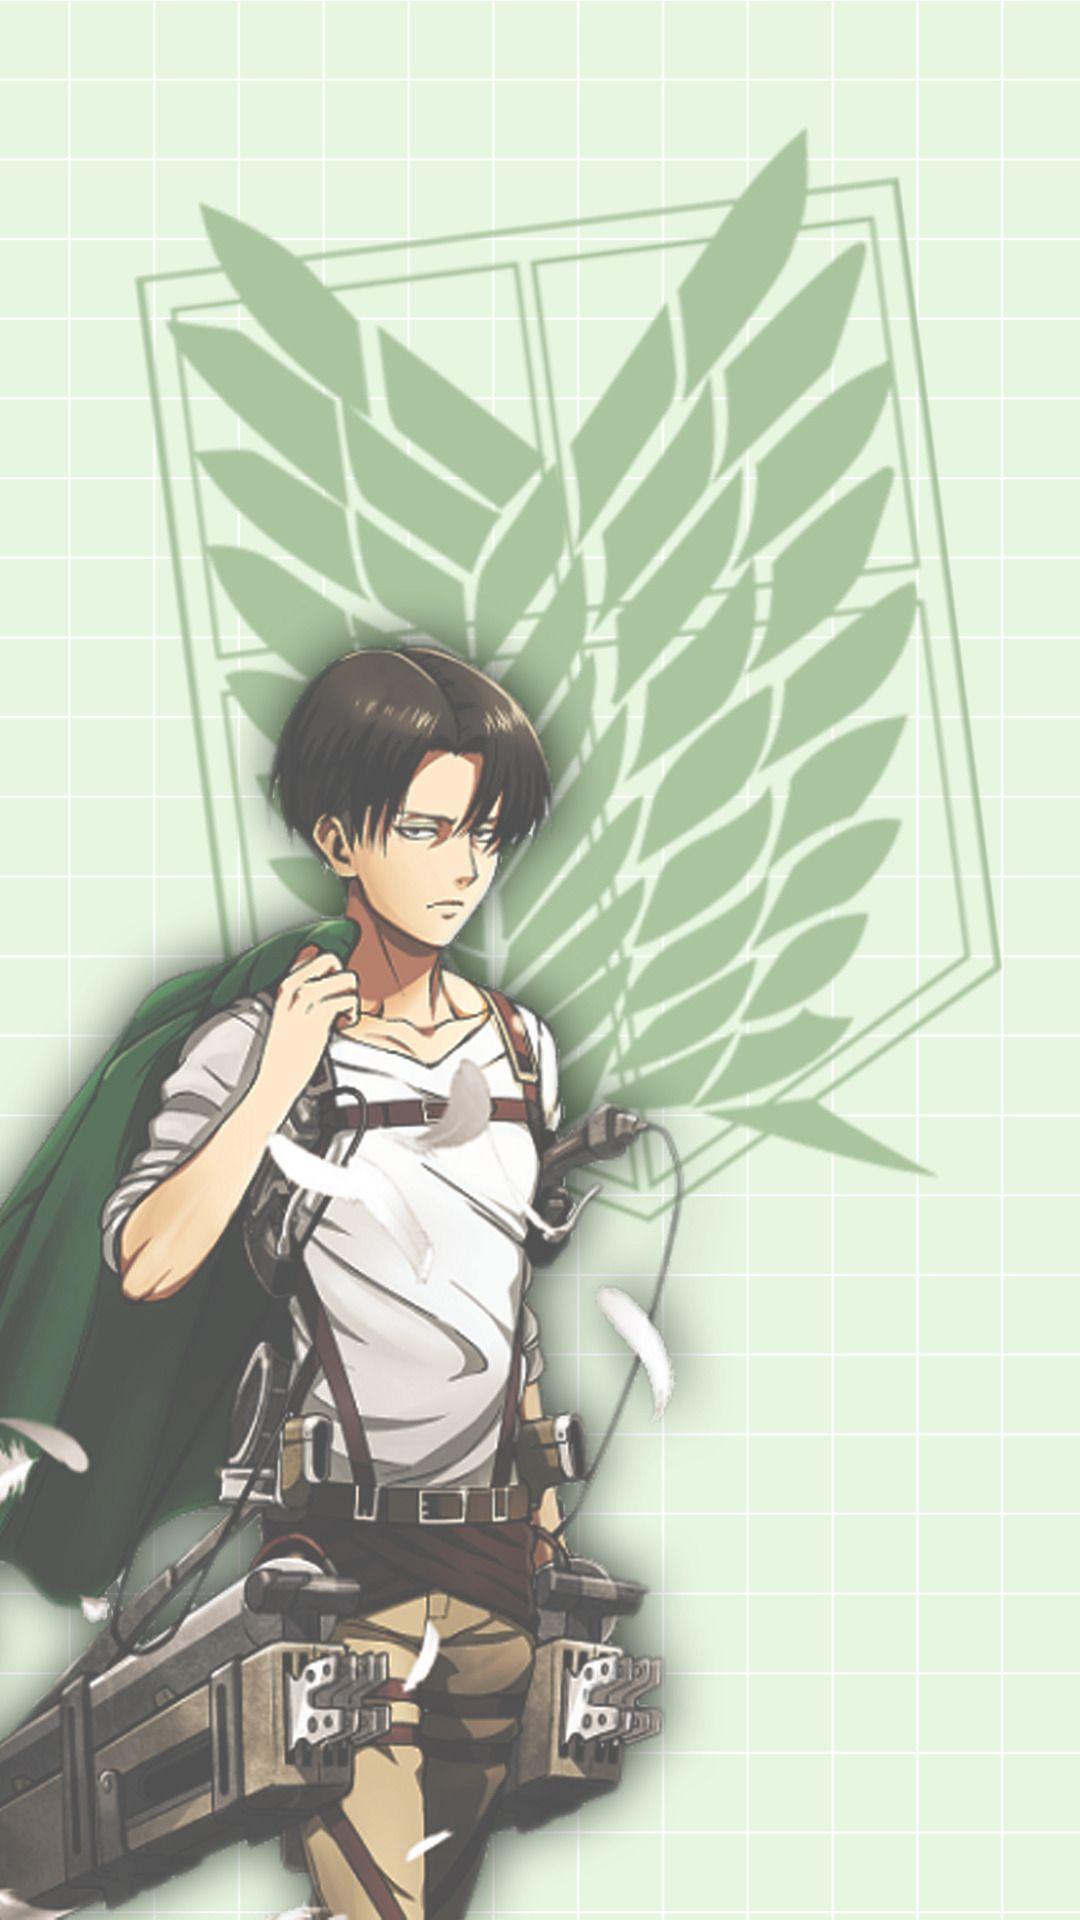 Wallpapers And Lockscreen Levi Ackerman Shingeki No Kyojin If You Attack On Titan Levi Levi Ackerman Anime Wallpaper